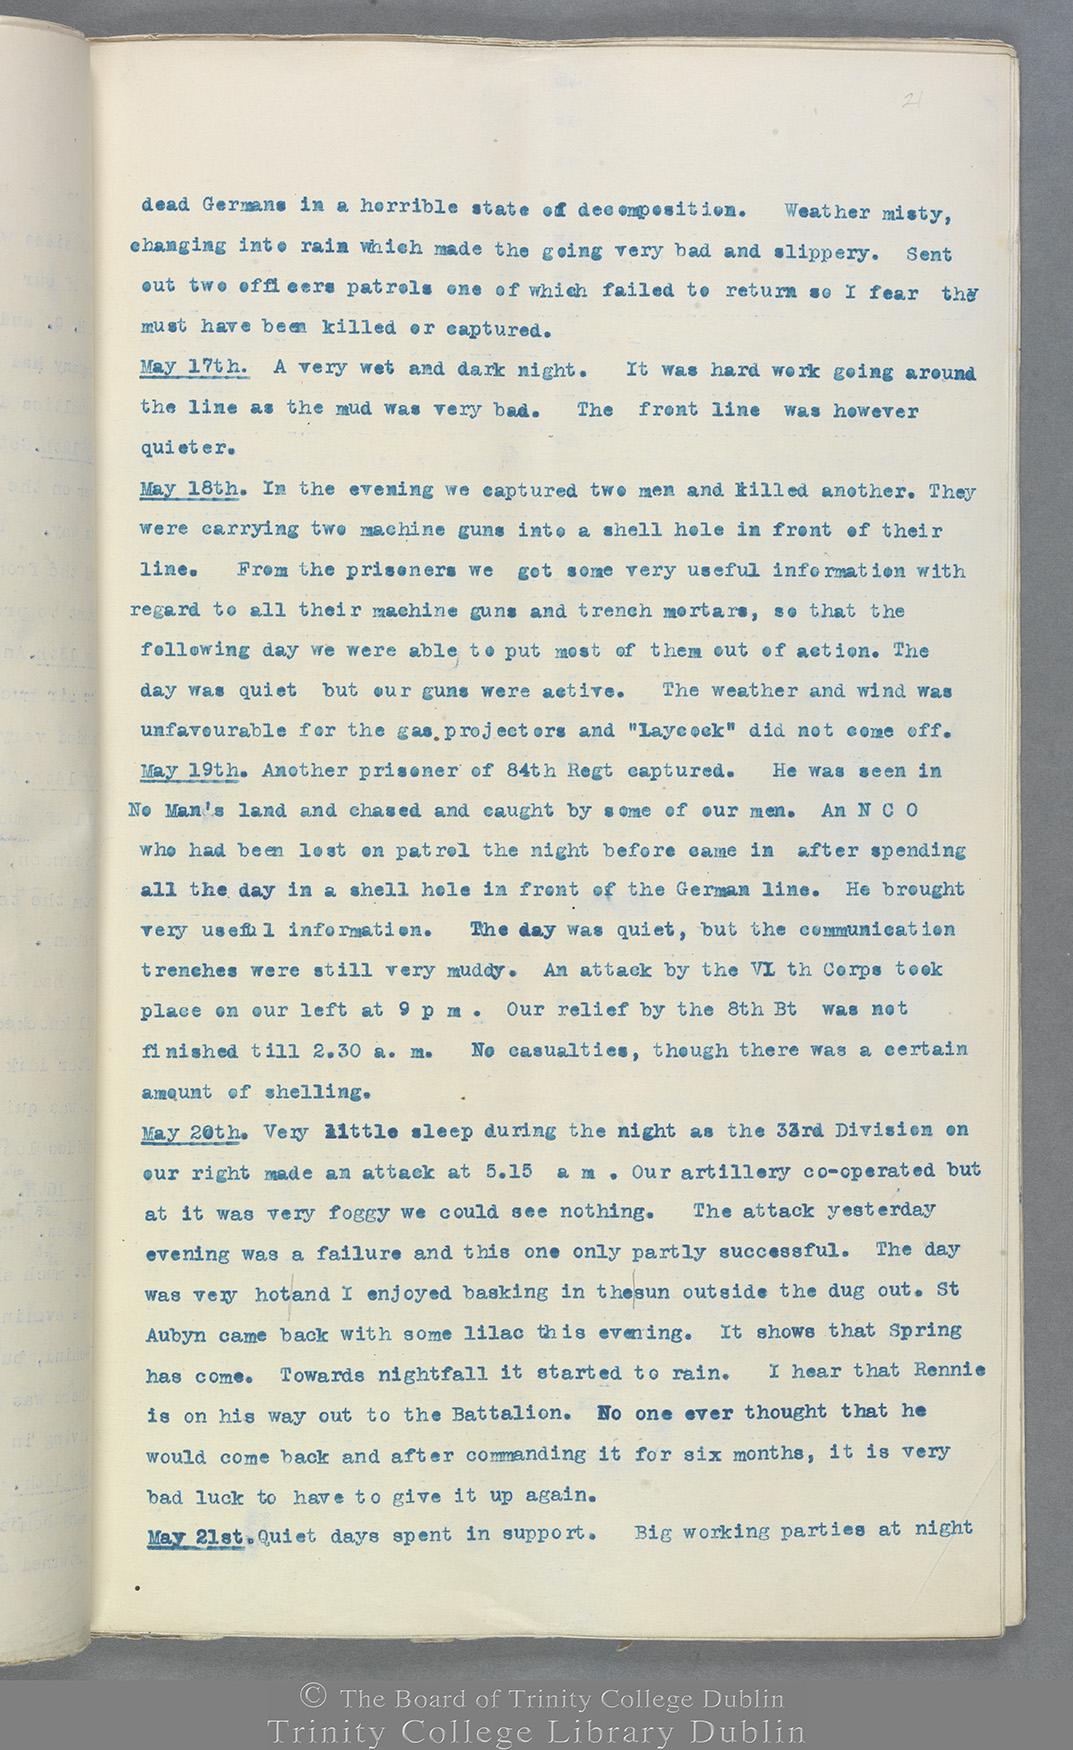 TCD MS 10822 folio 21 recto